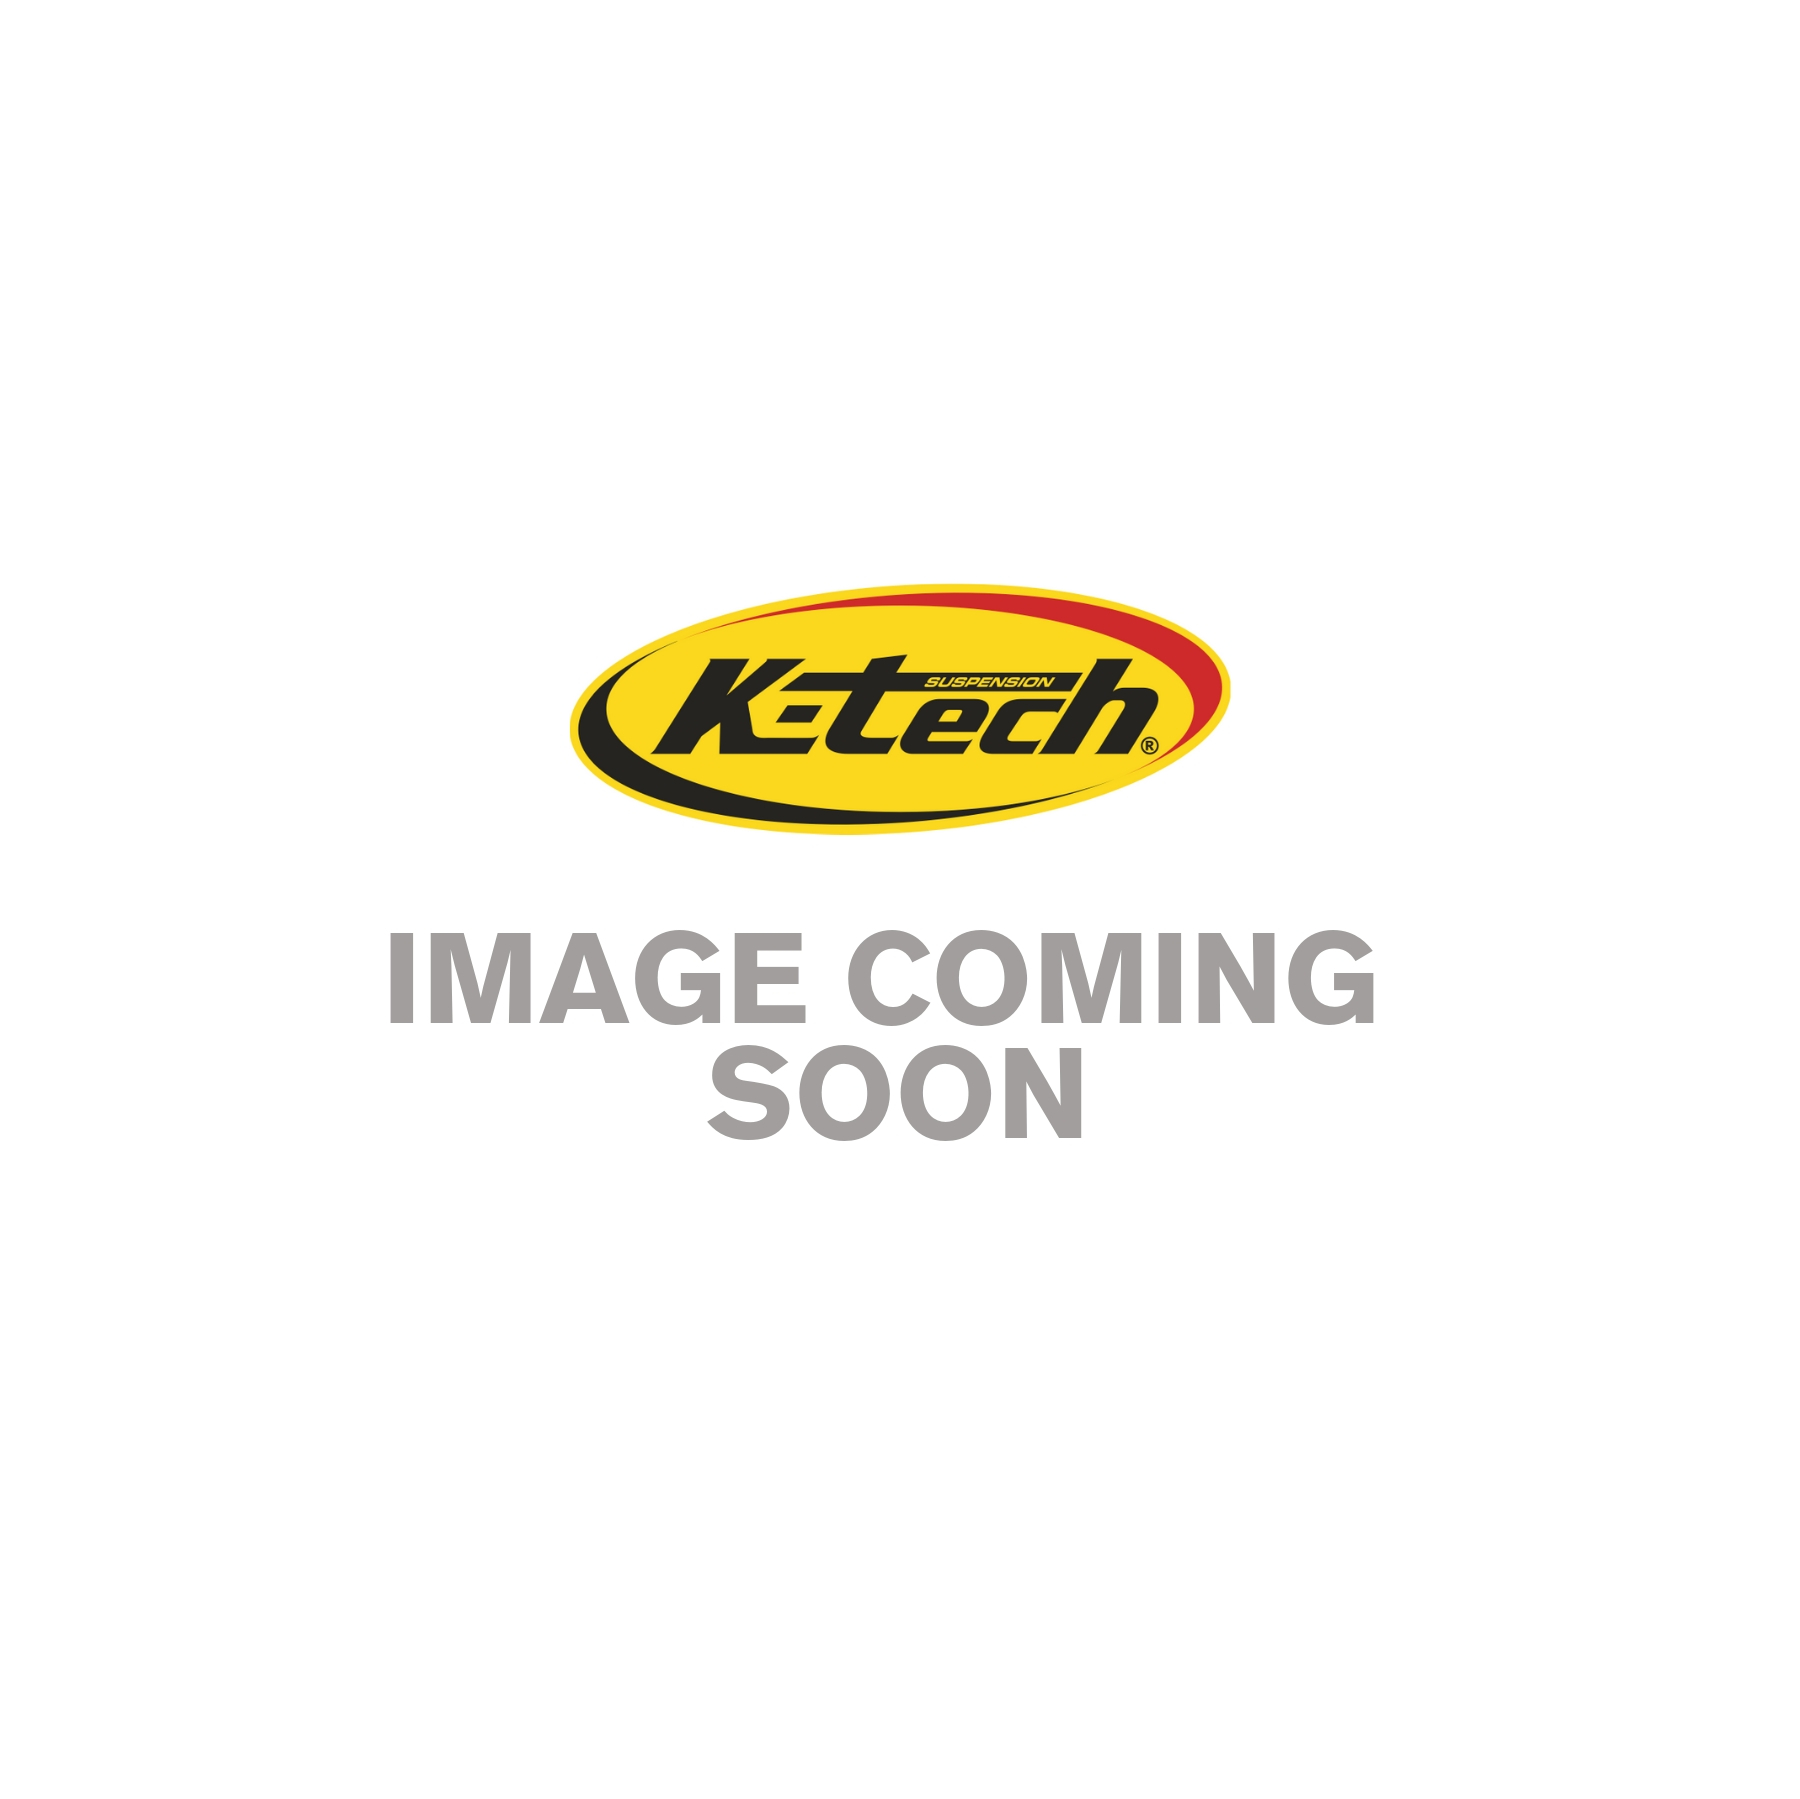 Front Fork Cartridges DDS Triumph Daytona 675 2013> KYB